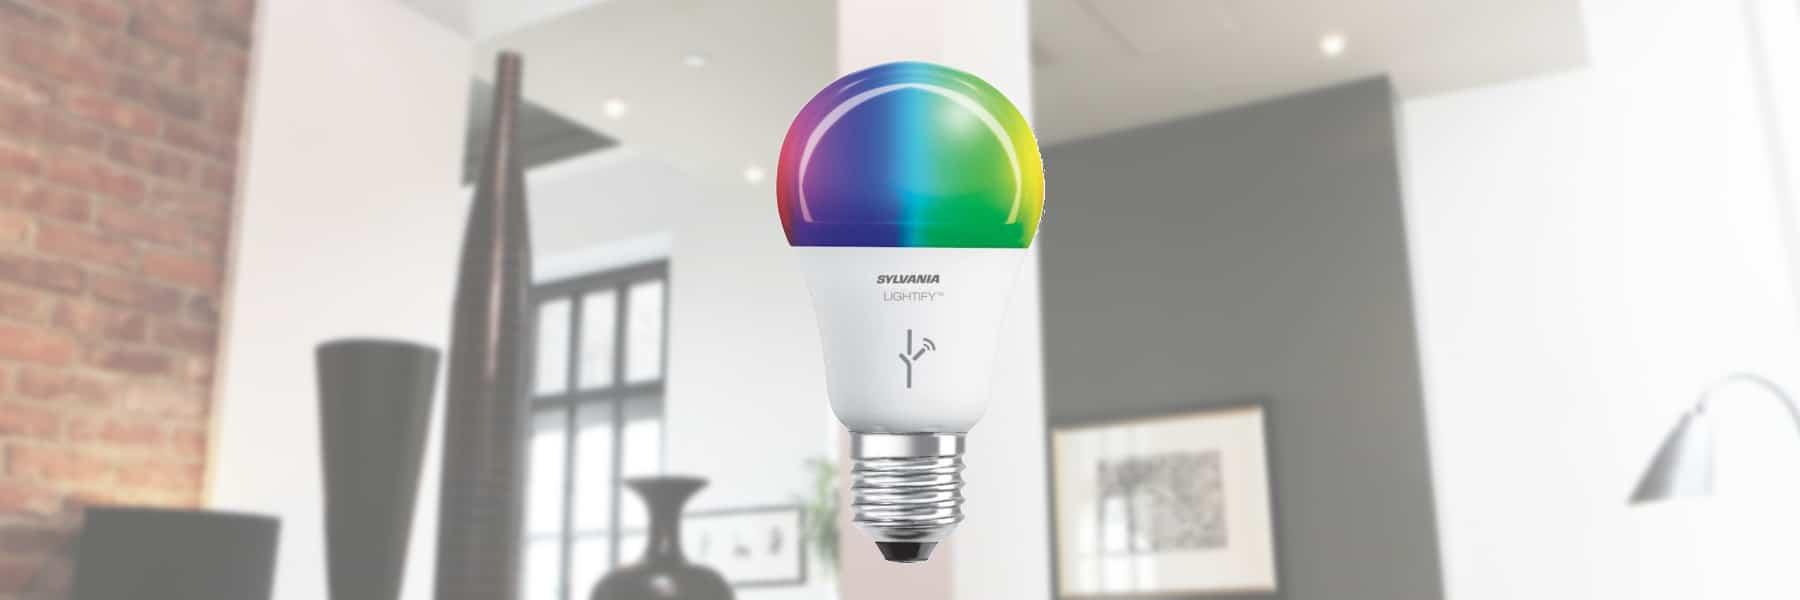 Sylvania stellt Bluetooth Lampen mit HomeKit Anbindung vor